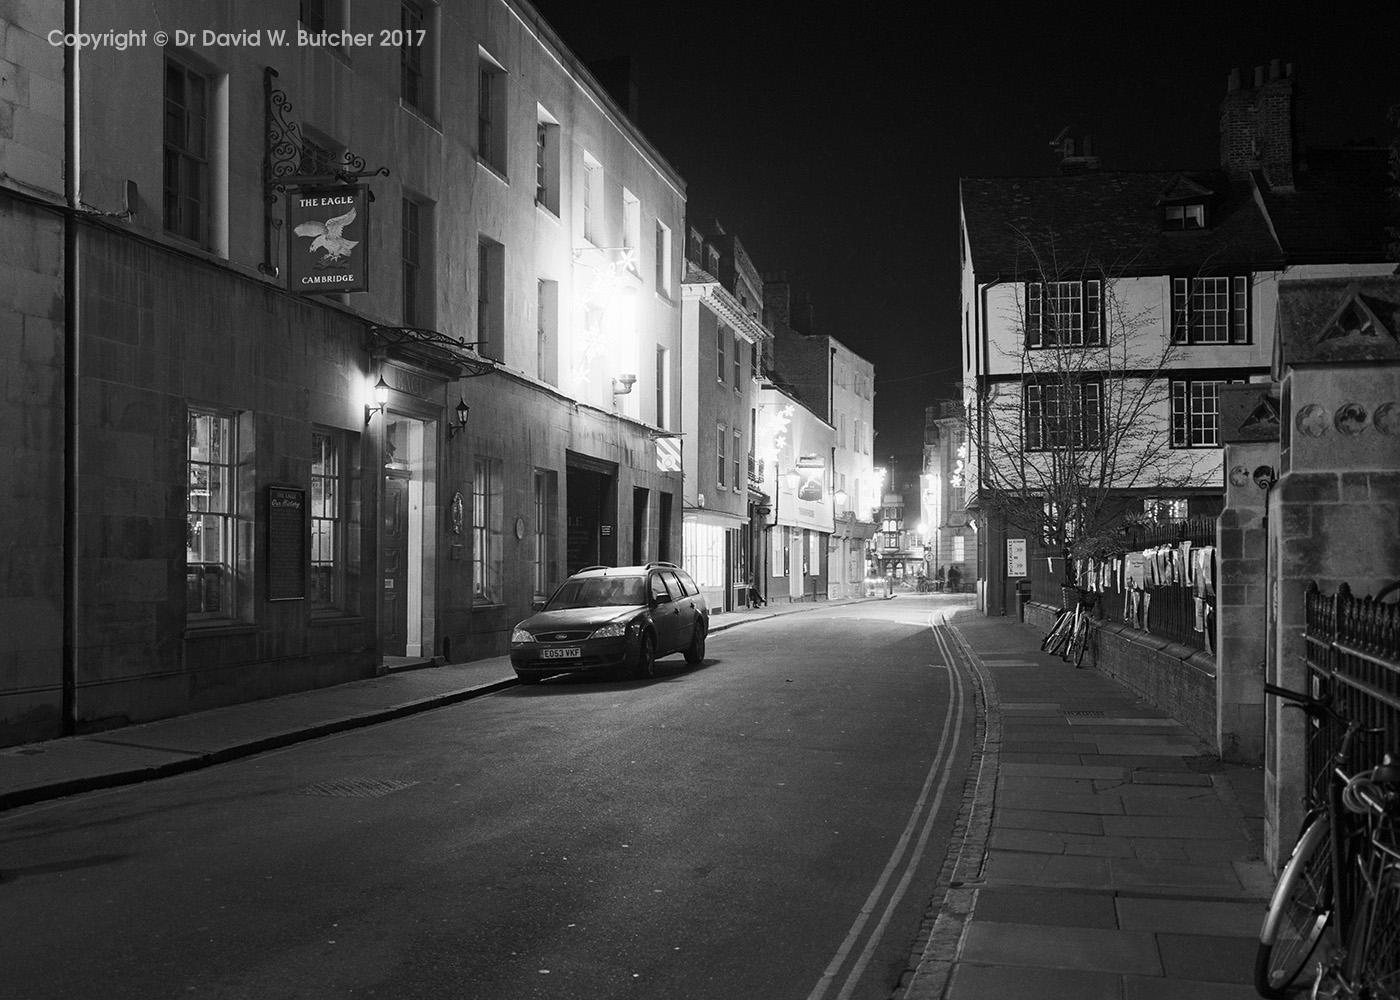 Cambridge Bene't Street at Night, England